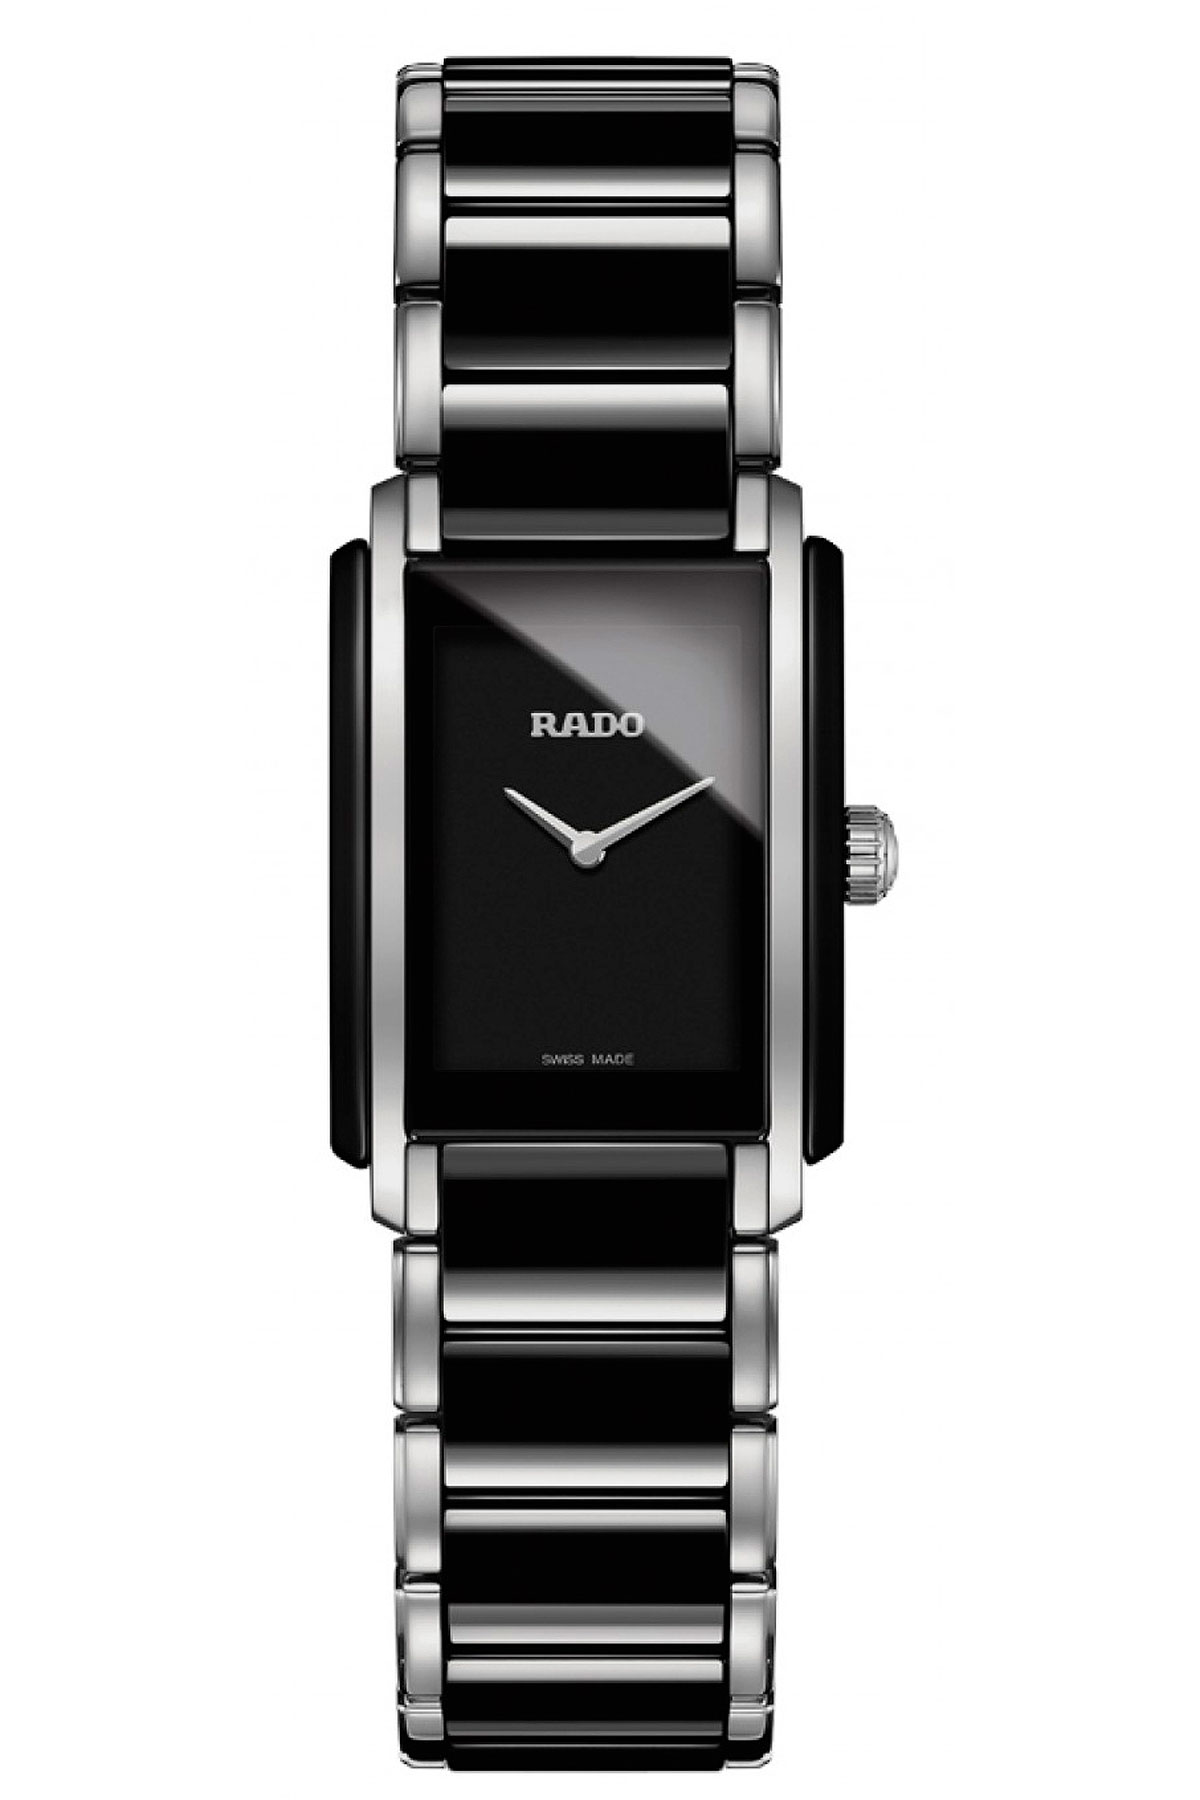 Rado_Watch_for_Women,_Black,_High-Tech_Ceramic,_2019